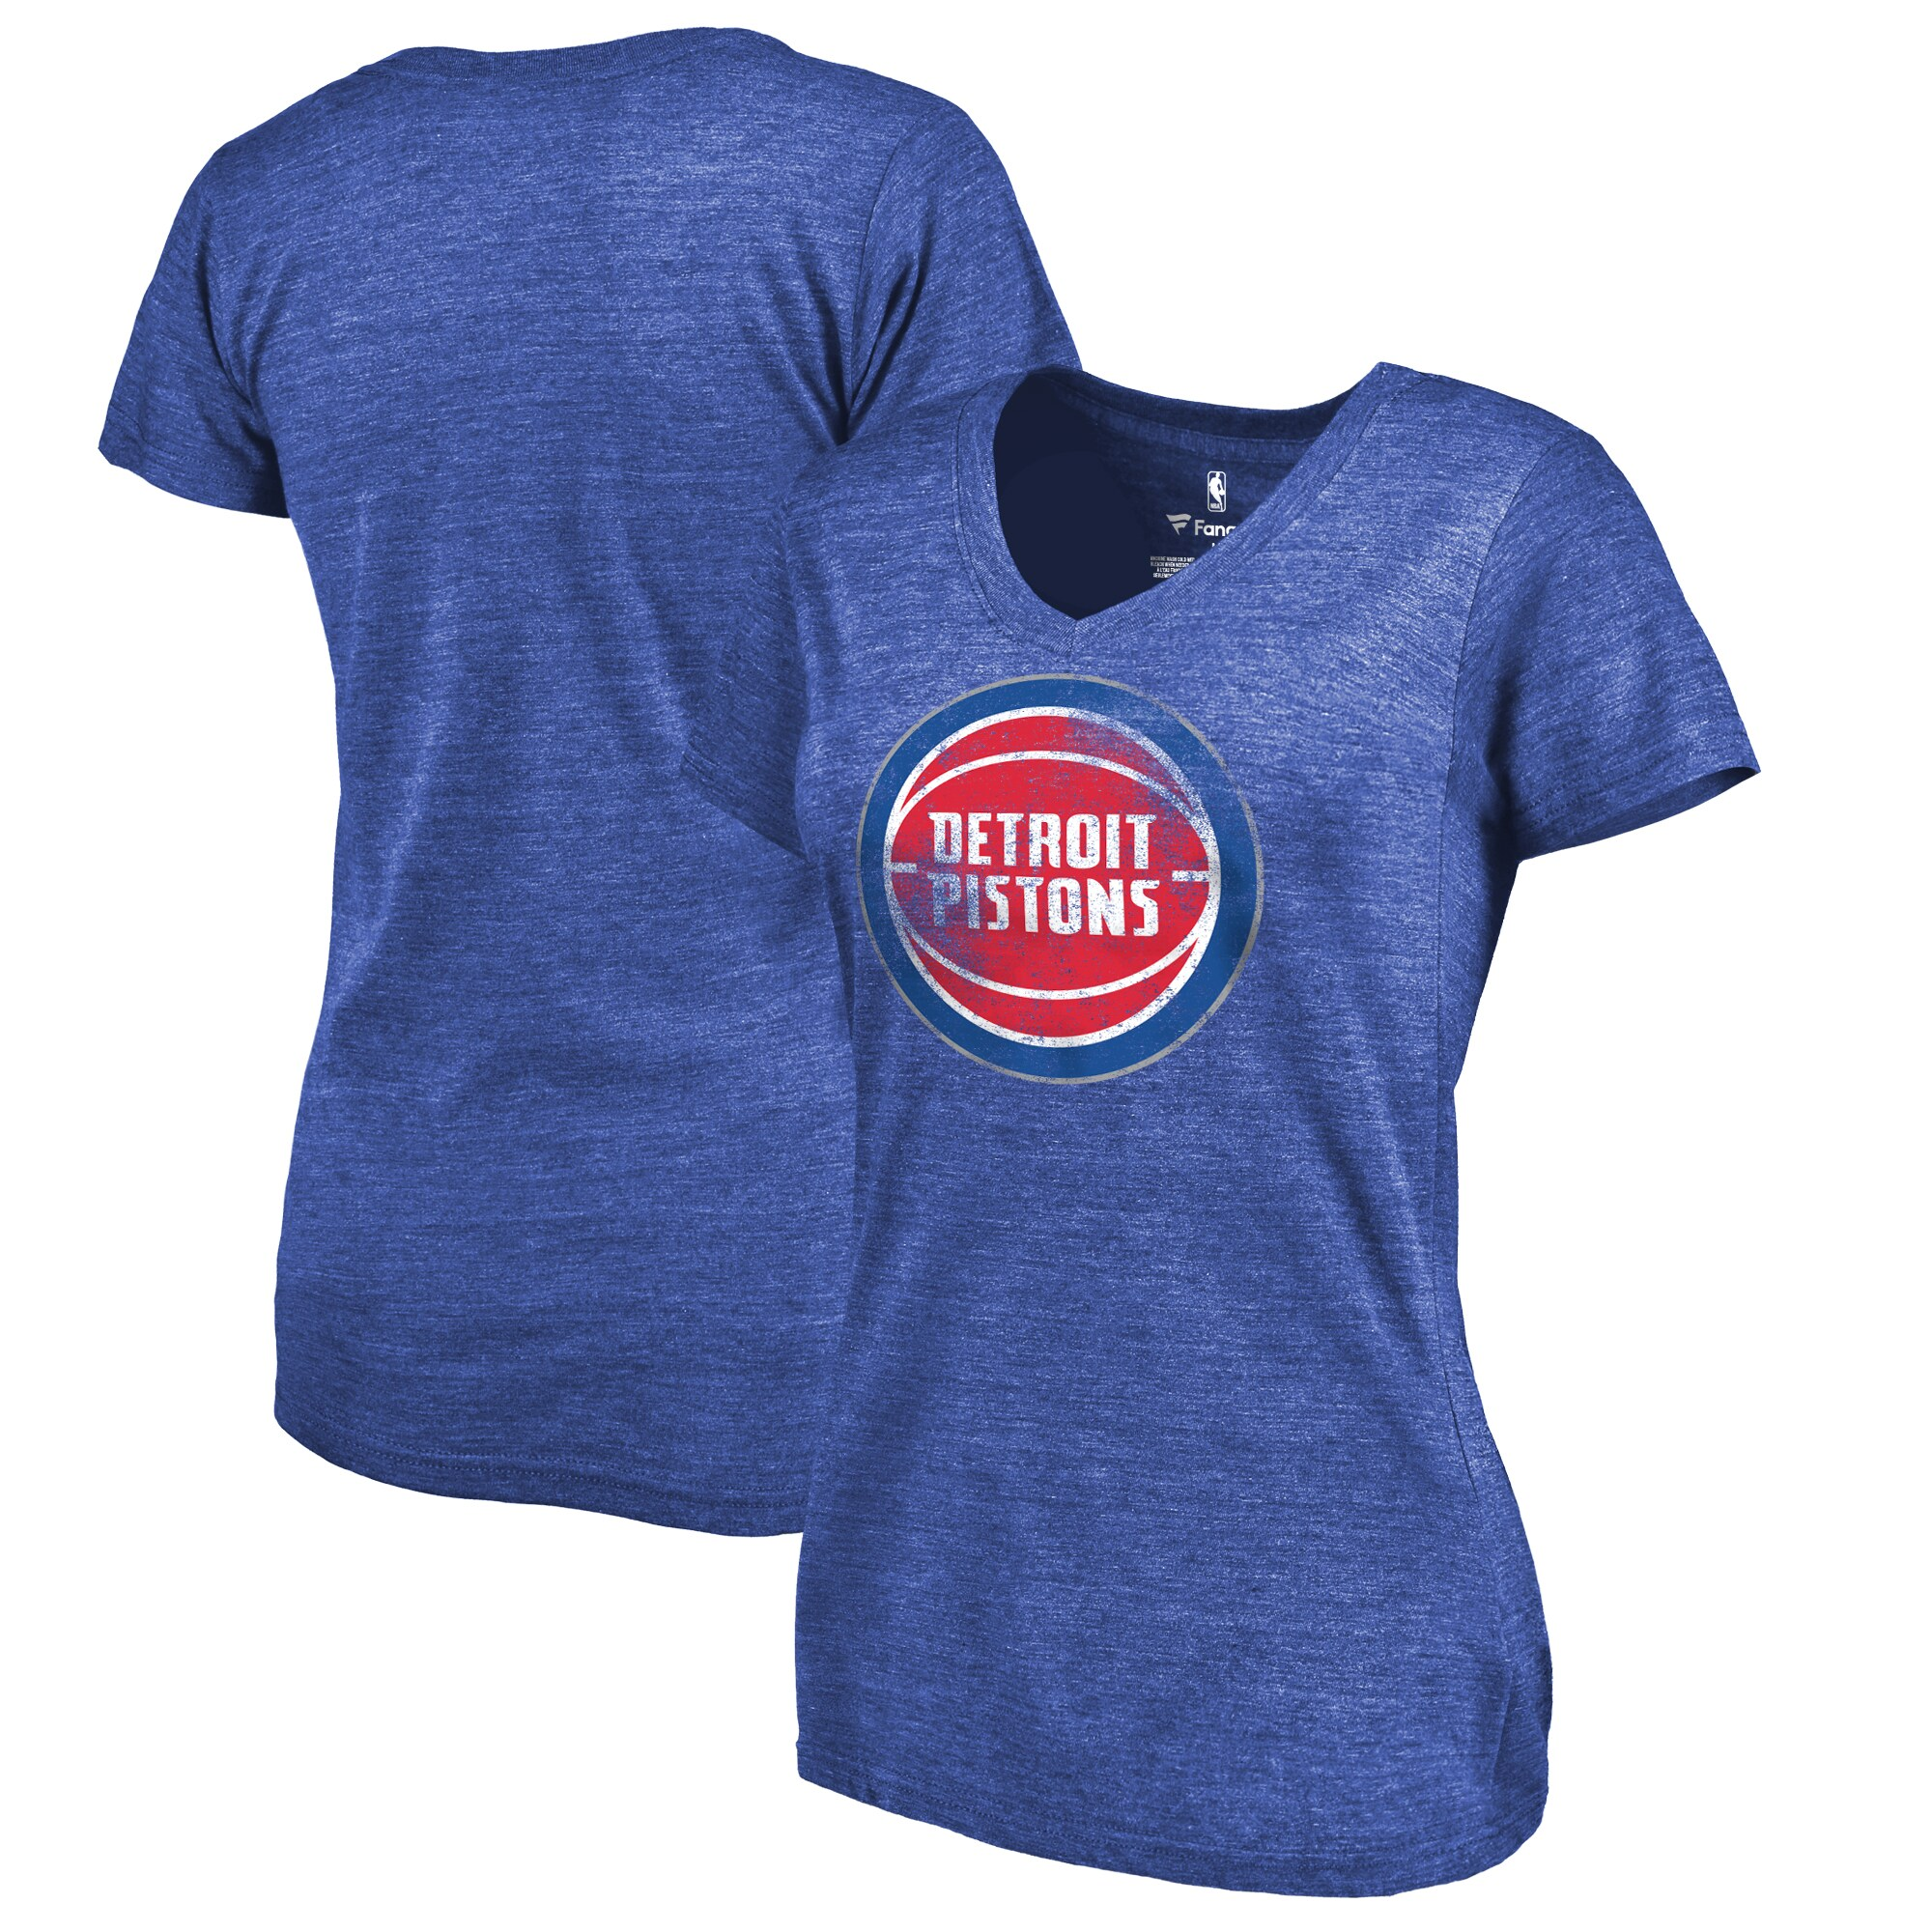 Detroit Pistons Fanatics Branded Women's Distressed Logo Tri-Blend V-Neck T-Shirt - Blue